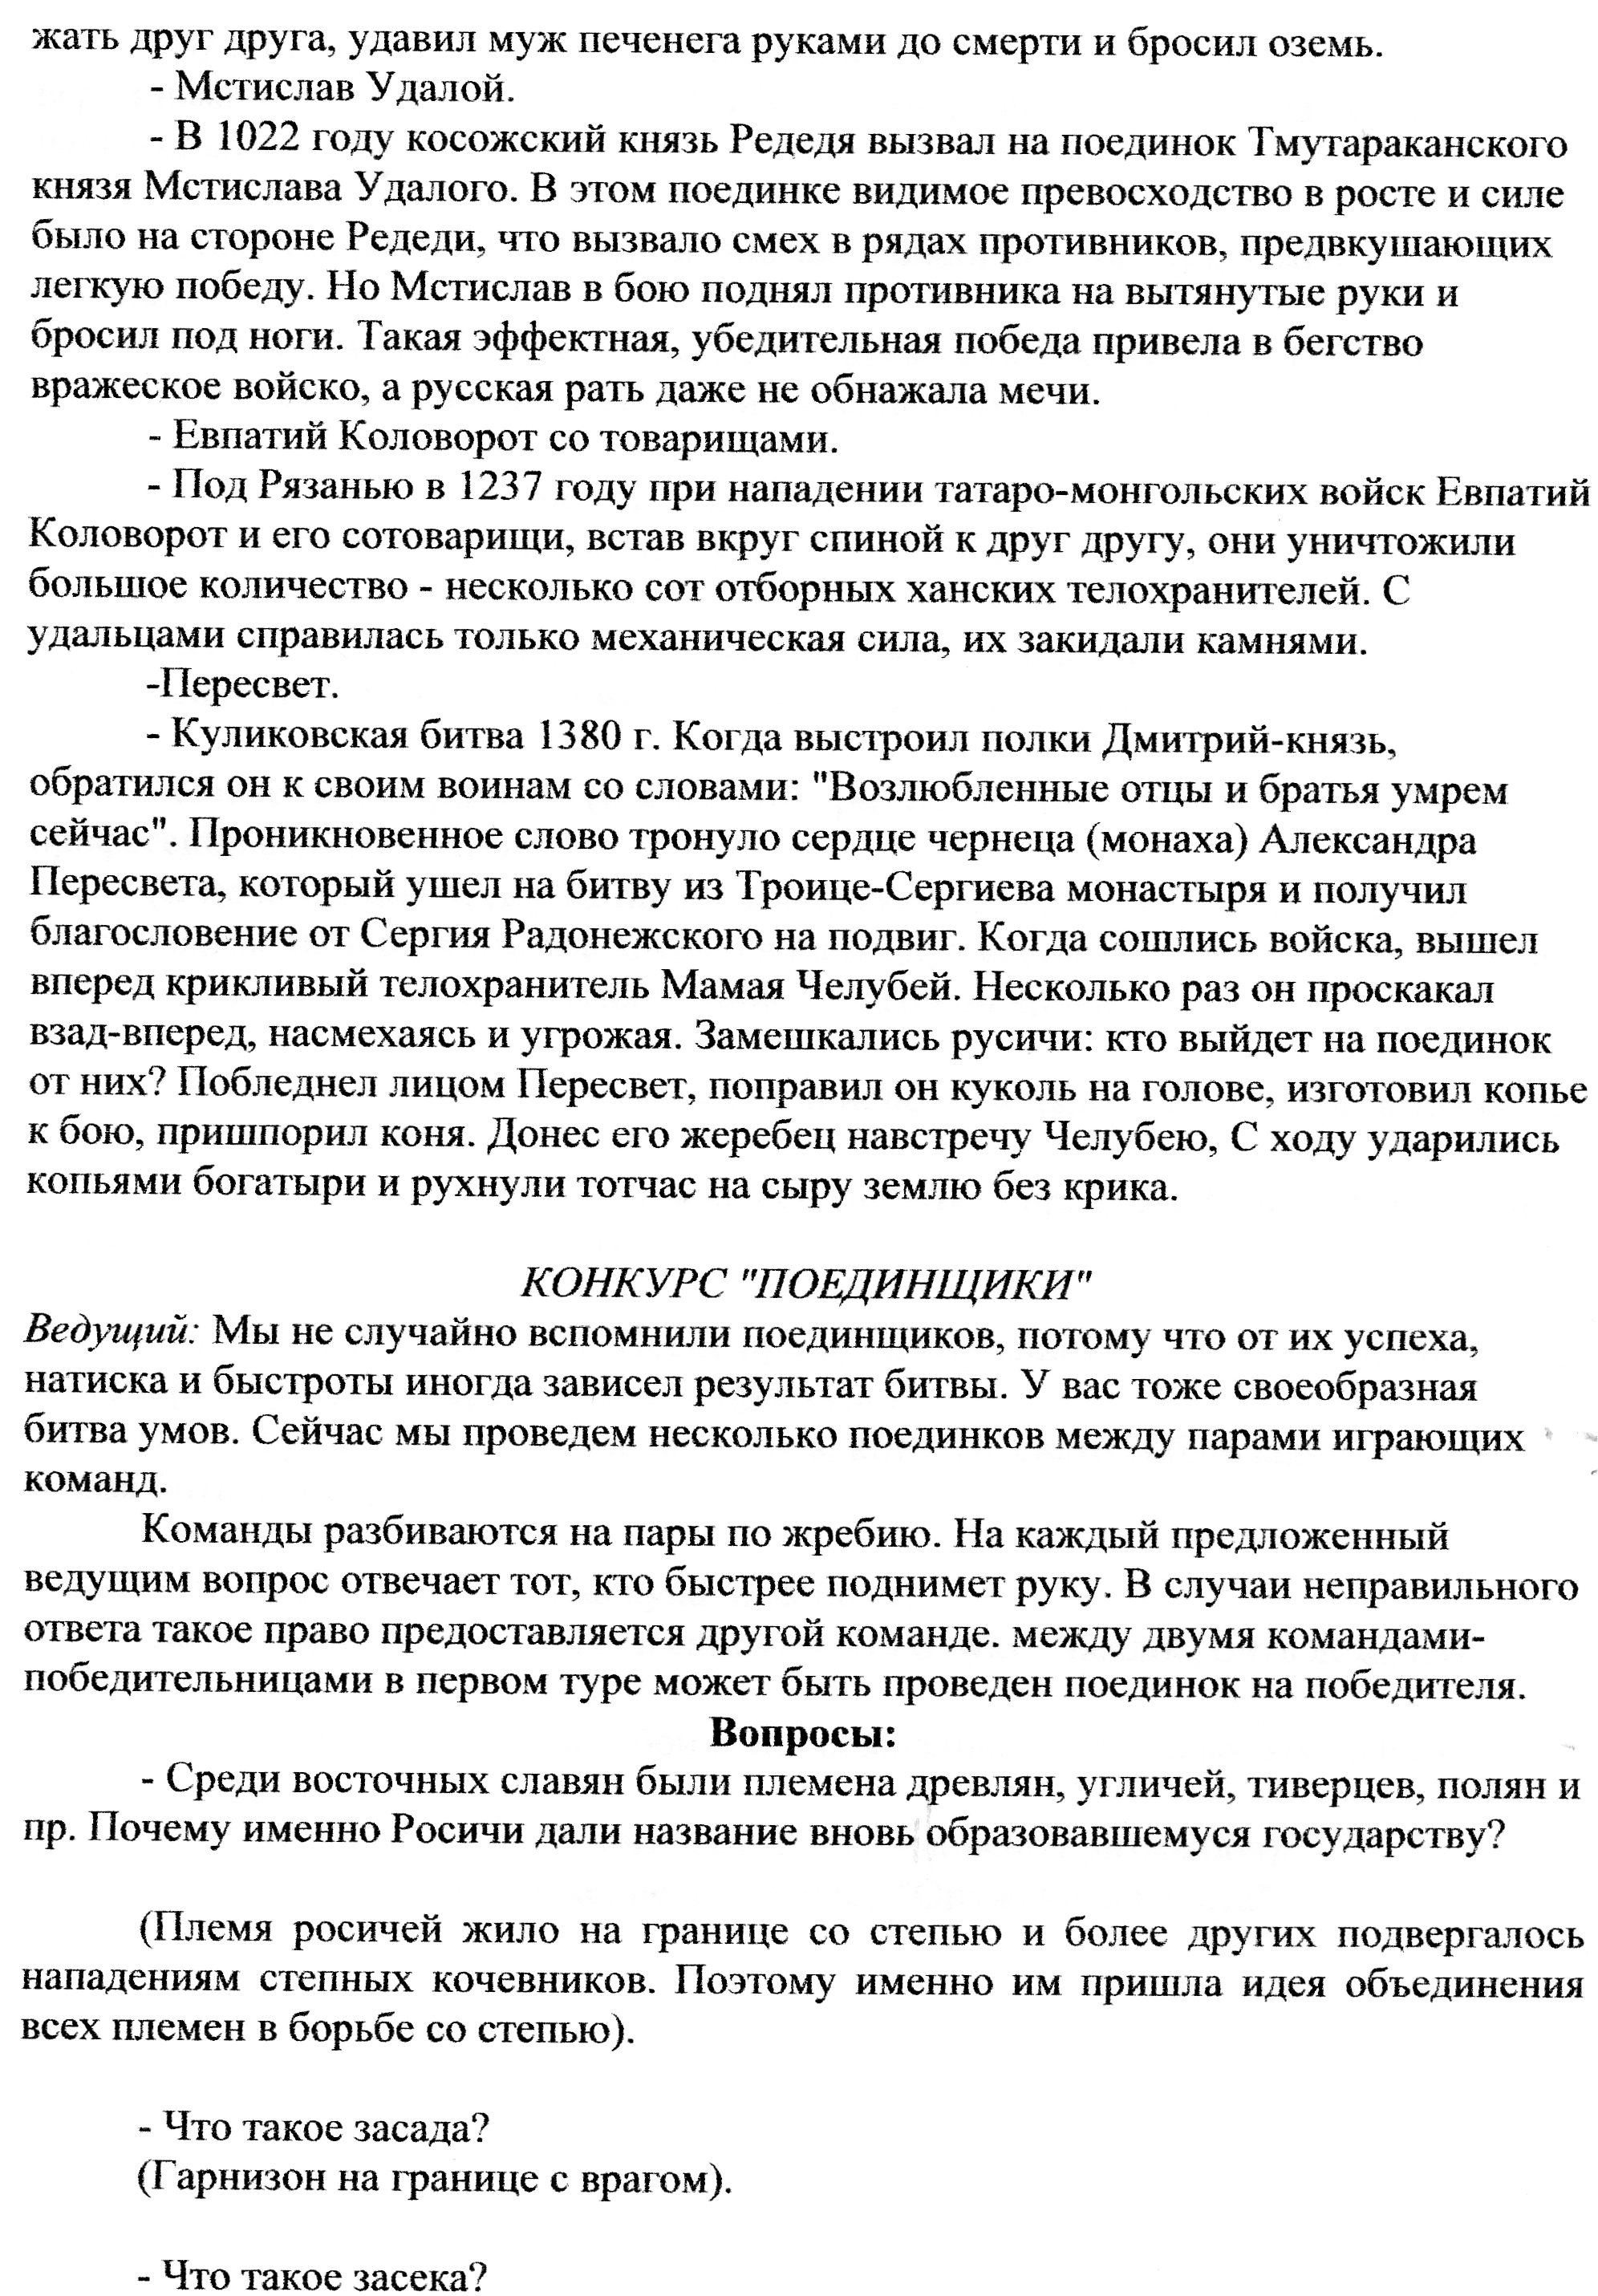 C:\Users\Ульяна\Pictures\скан479.jpg